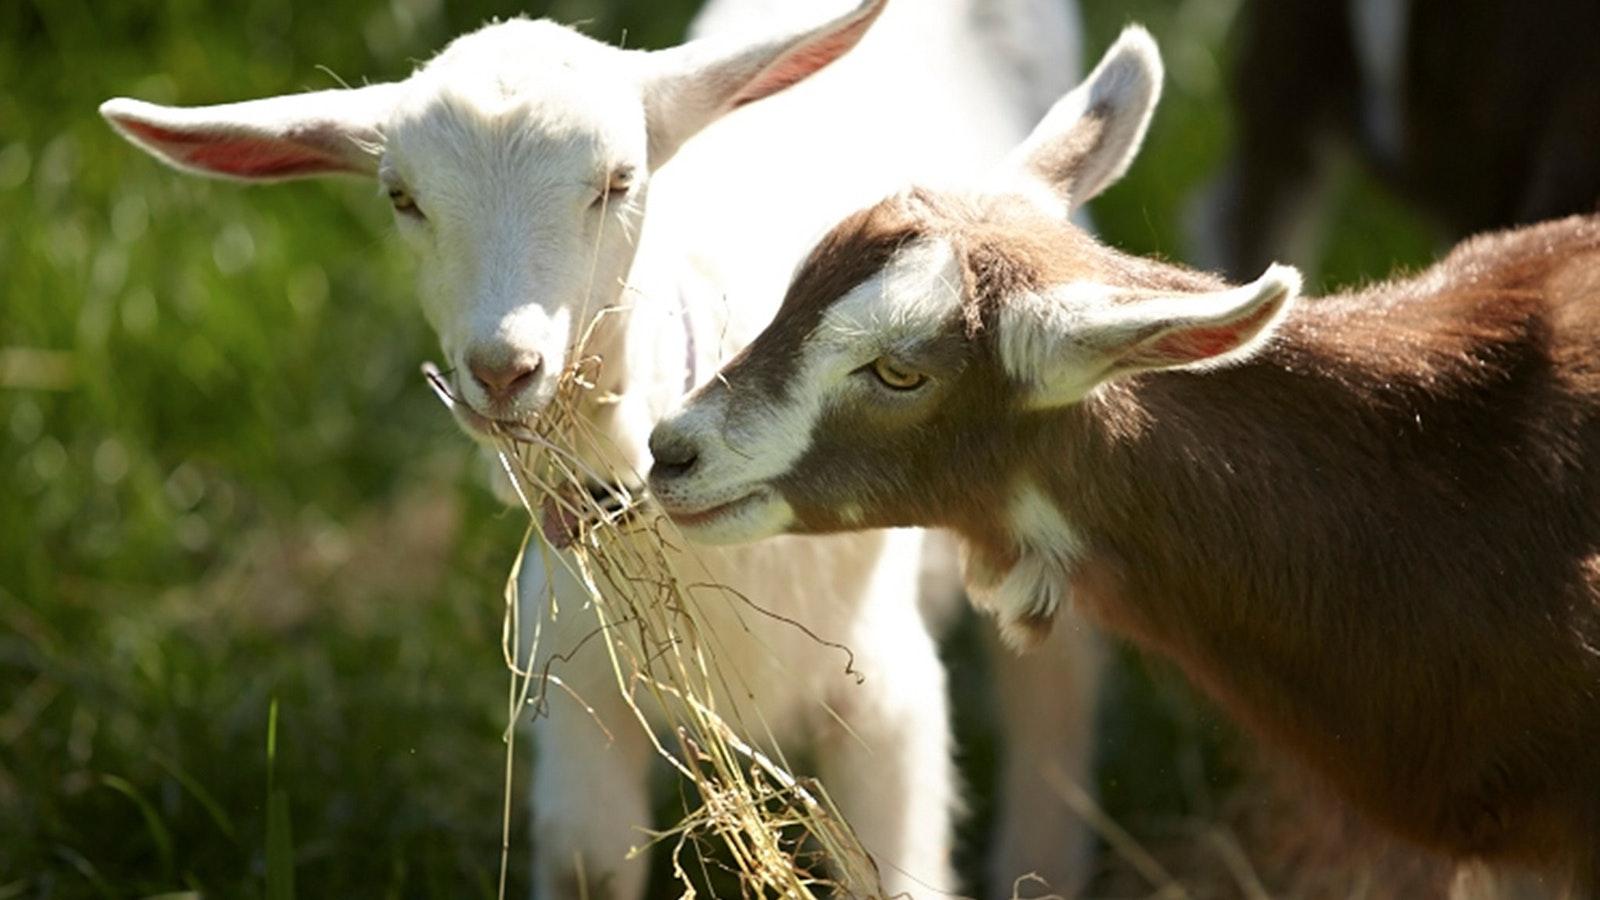 Enjoy some local produce from Main Ridge Goat Dairy, Mornington Peninsula Scenic Wine Tour